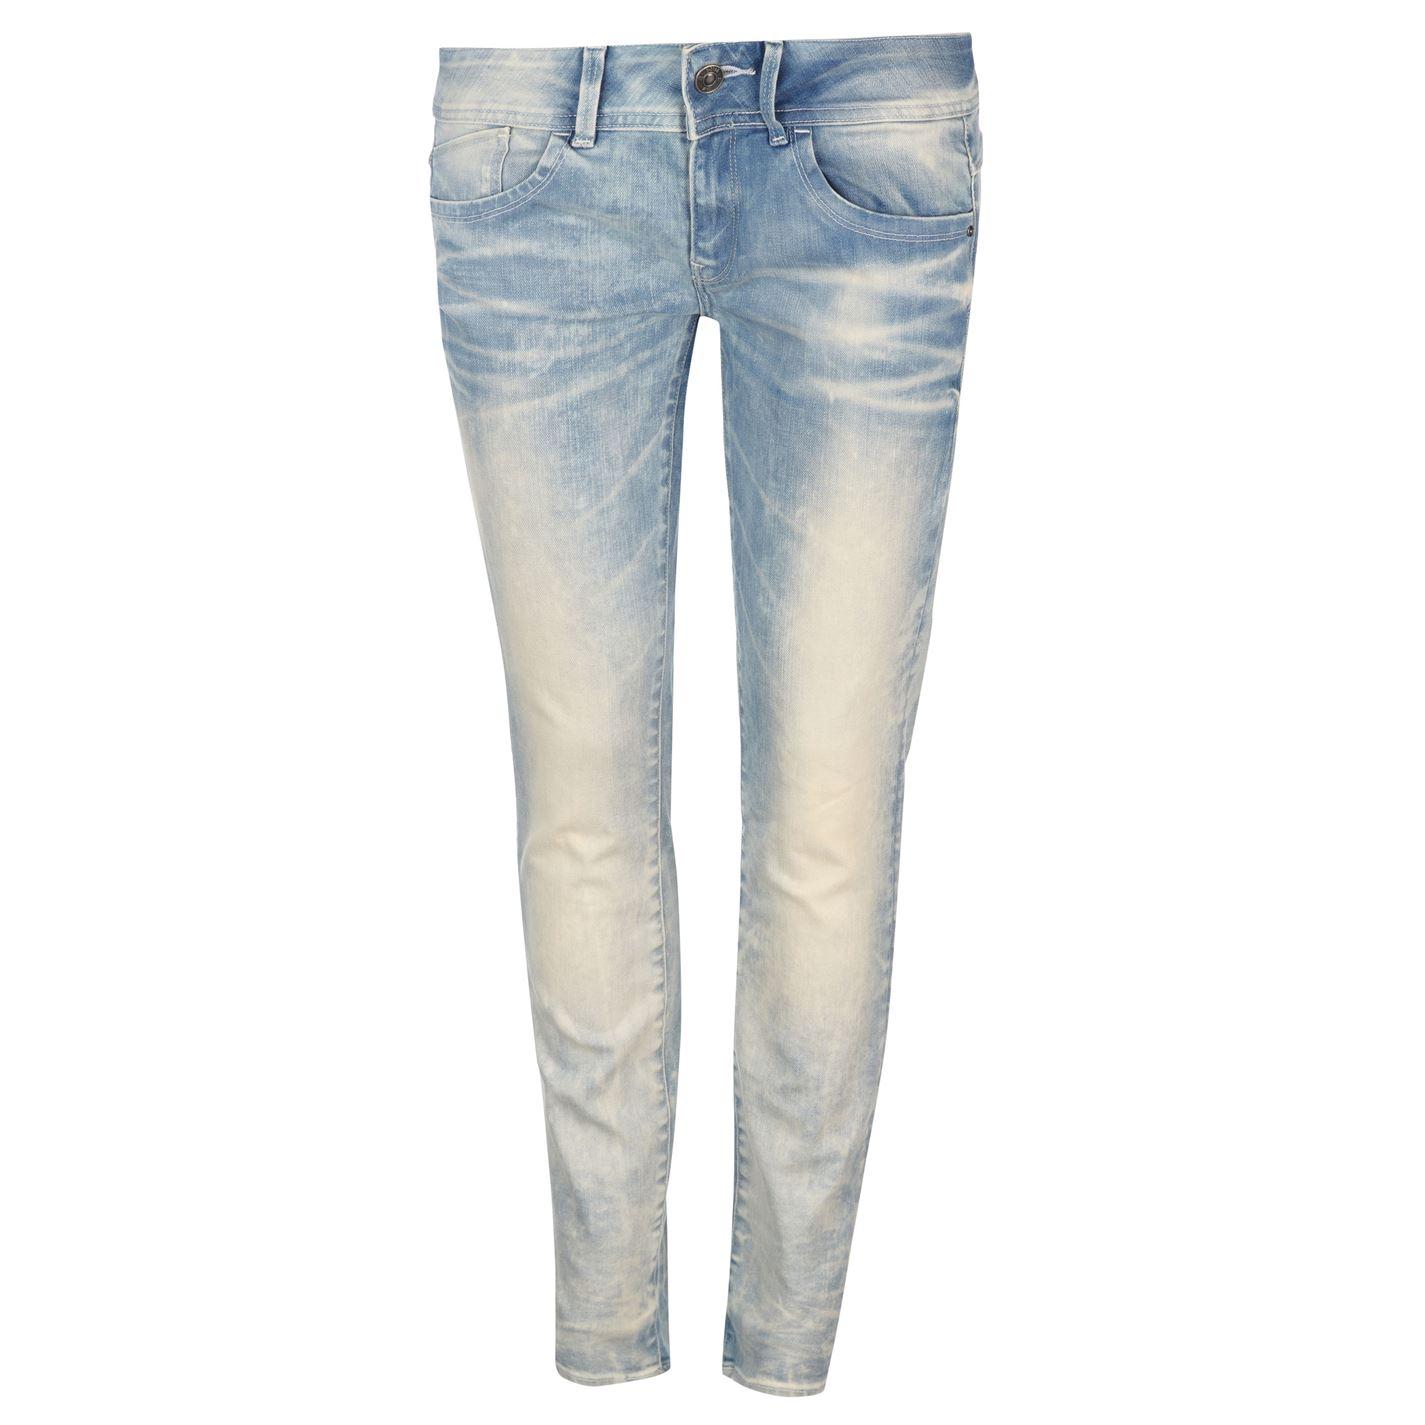 G Star 60885 Skinny Jeans